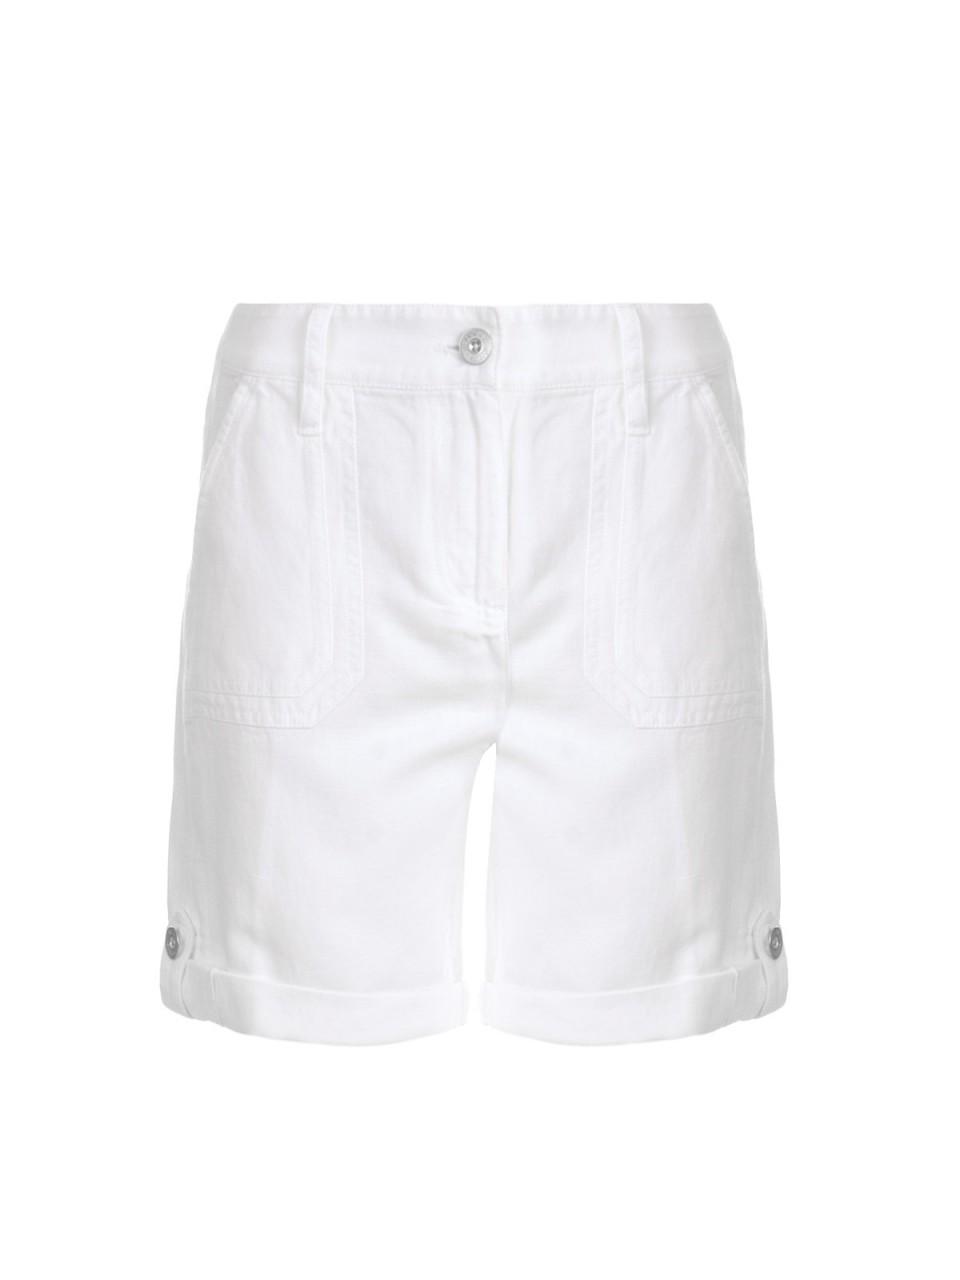 milano-italy-damen-shorts-wei-szlig-